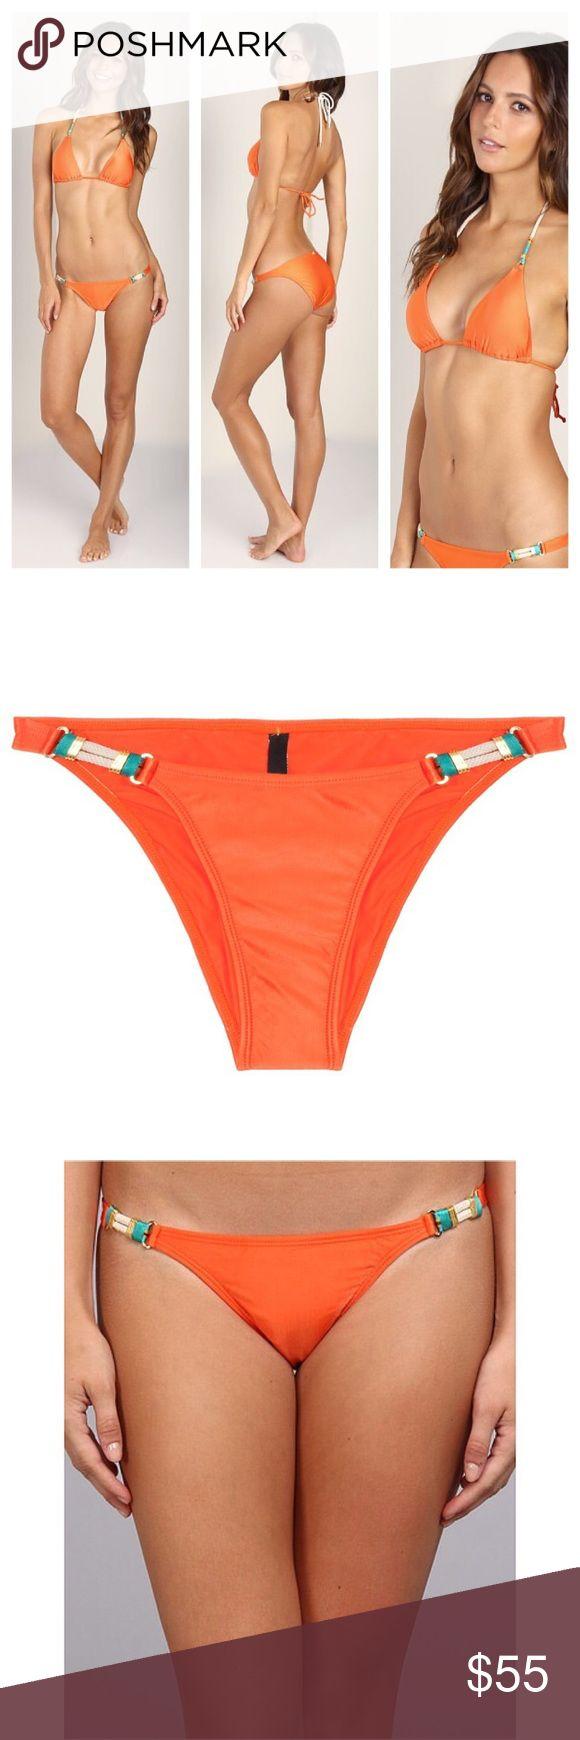 ViX Orange Rope Detail Brazilian Bikini Bottom M New with tags and hygienic liner. Size medium. Gorgeous rope detail and turquoise thread. Brazilian cut. Bottom only Vix Swim Bikinis